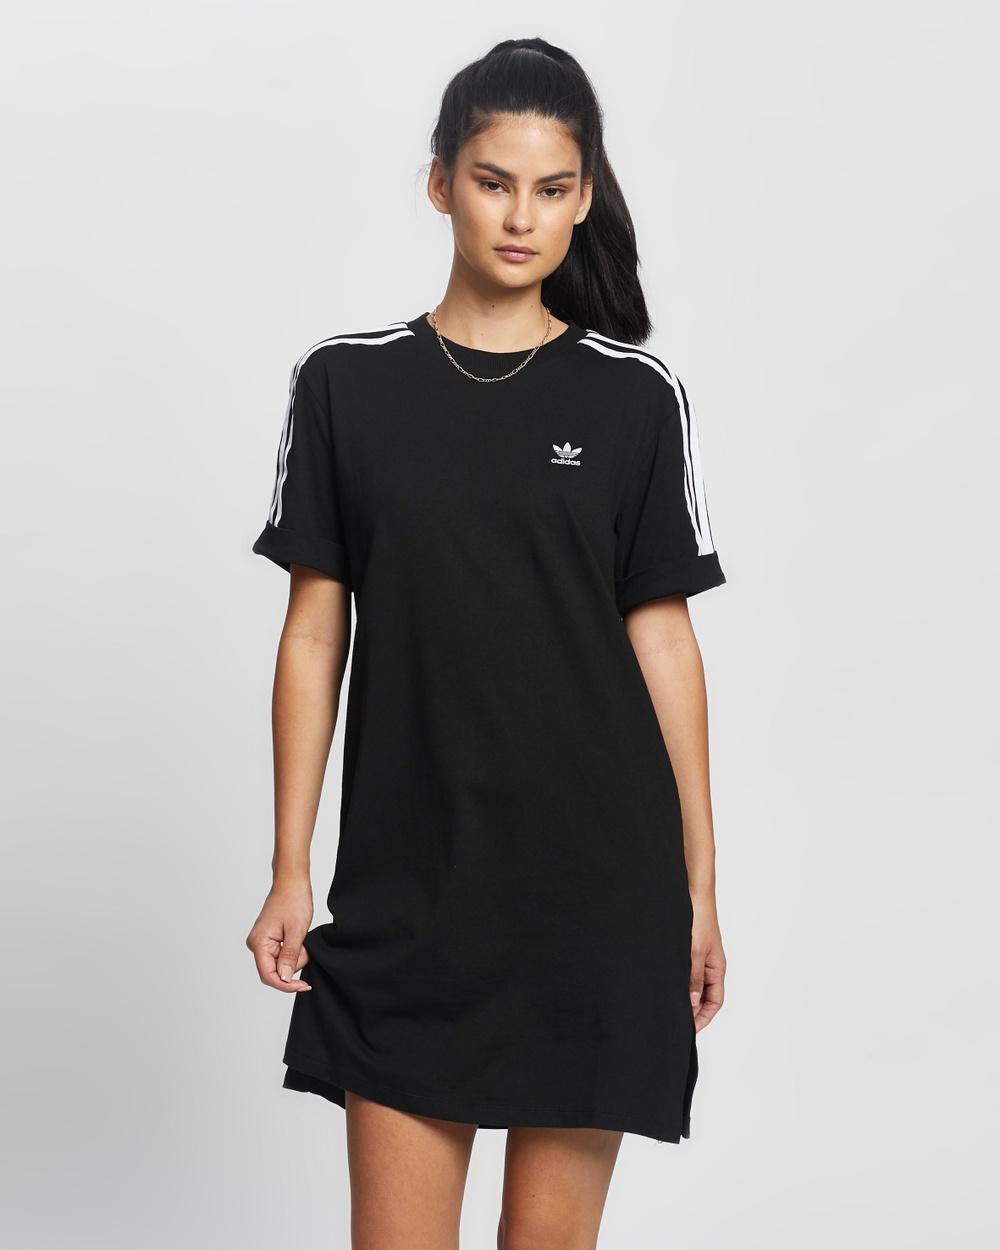 adidas Originals Dresses Black